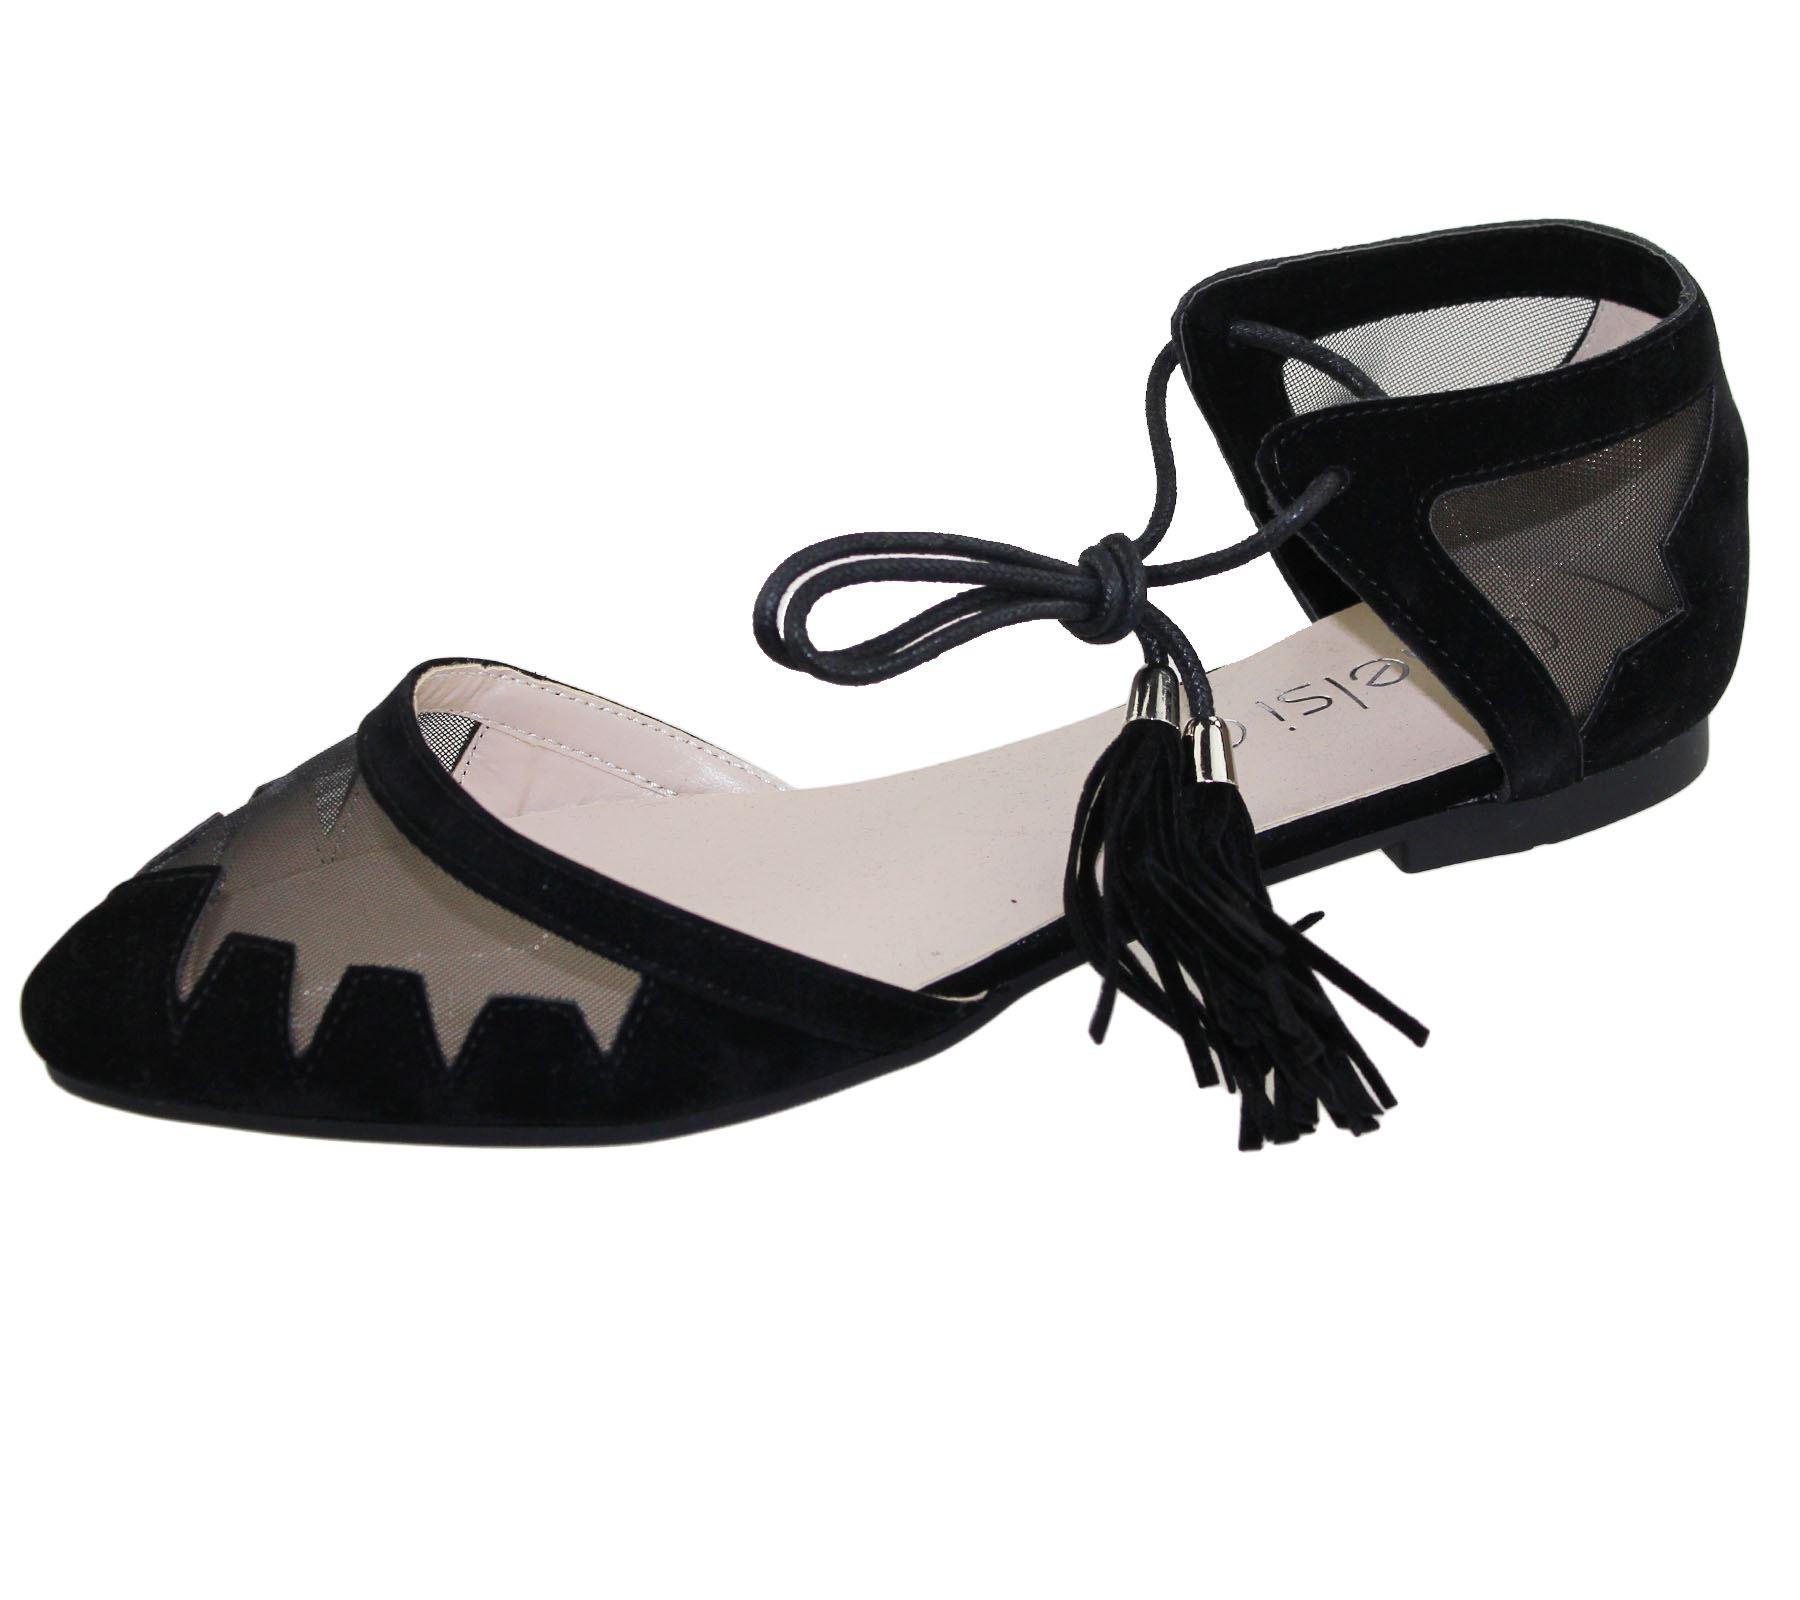 Womens-Flat-Ballerina-Dolly-Pumps-Ballet-Ladies-Summer-Mesh-Tassel-Shoes-Sandals thumbnail 35